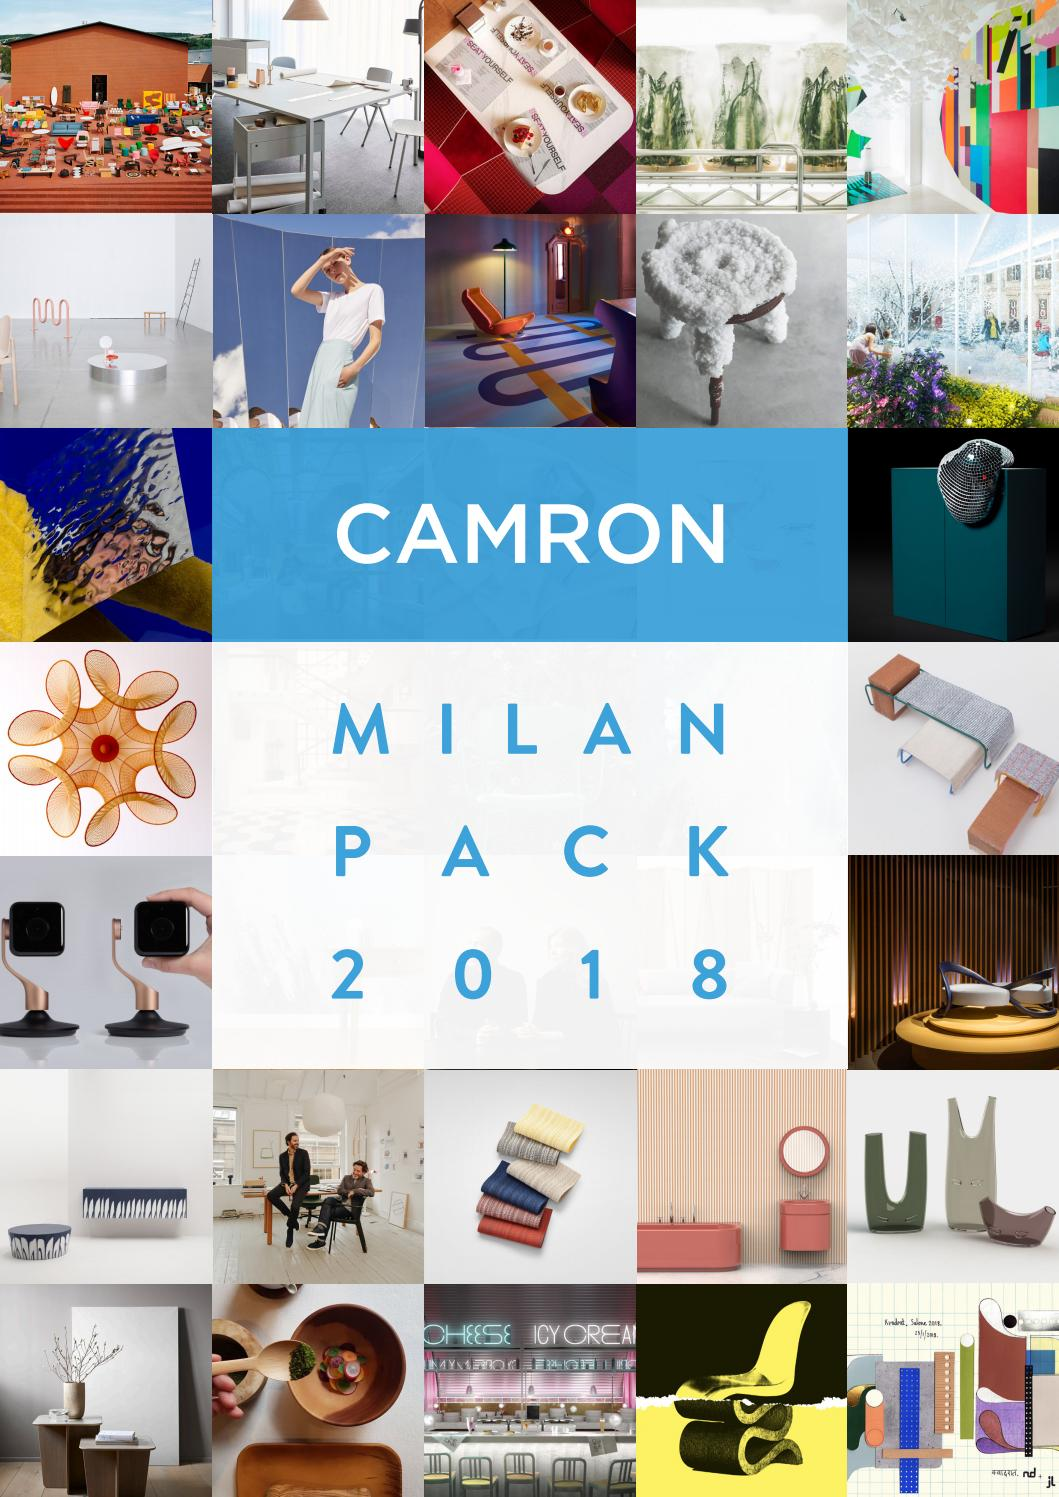 Camron Milan Pack 2018 by Camron PR issuu